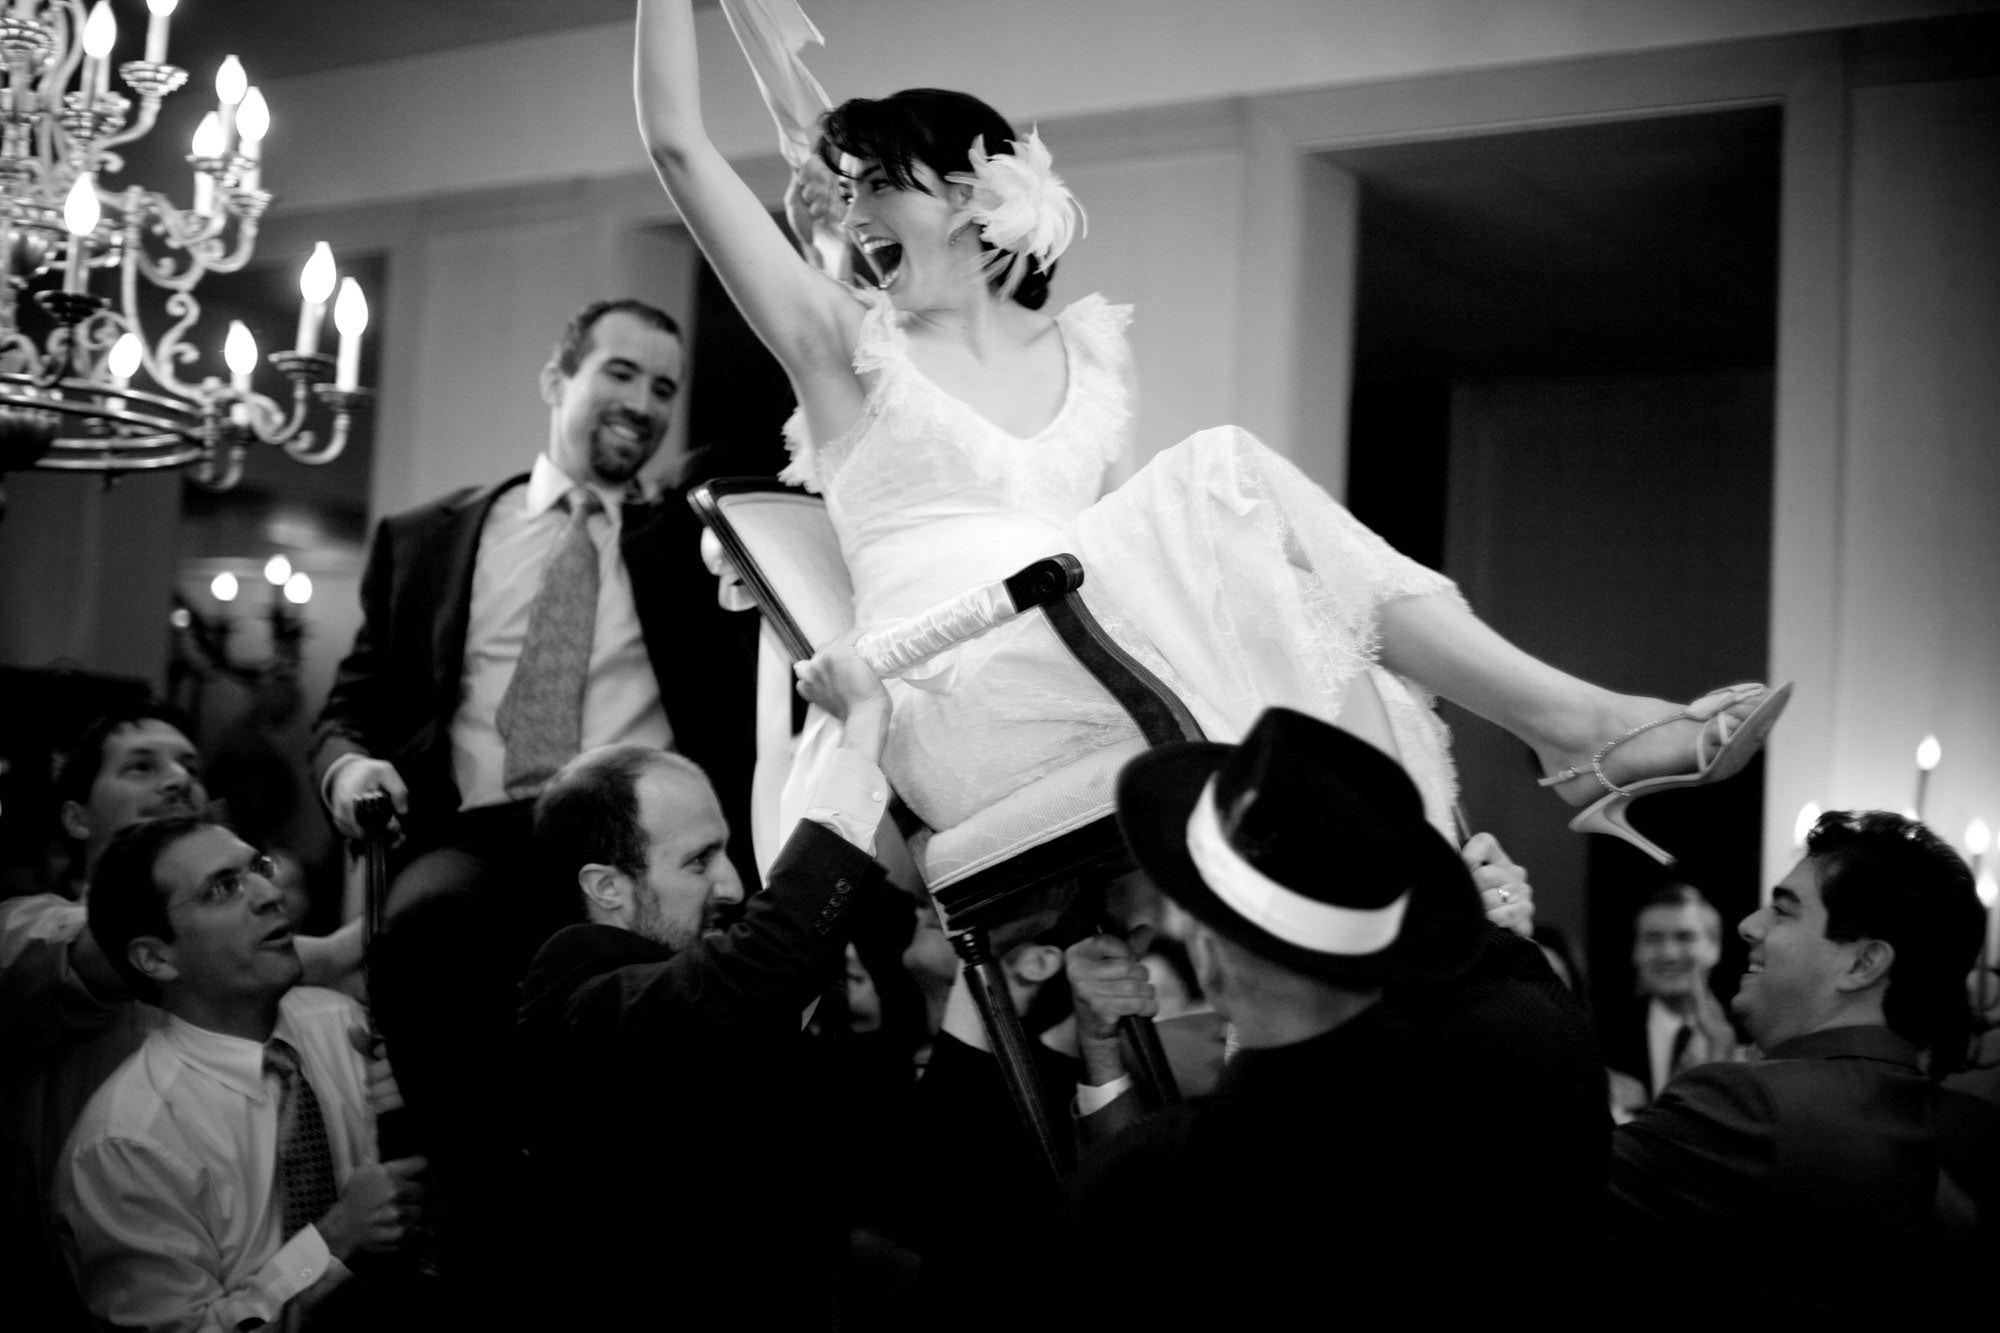 joyous-hora-dance-black-white-photography-worlds-best-wedding-photos-san-juan-island-photographers-la-vie-photo